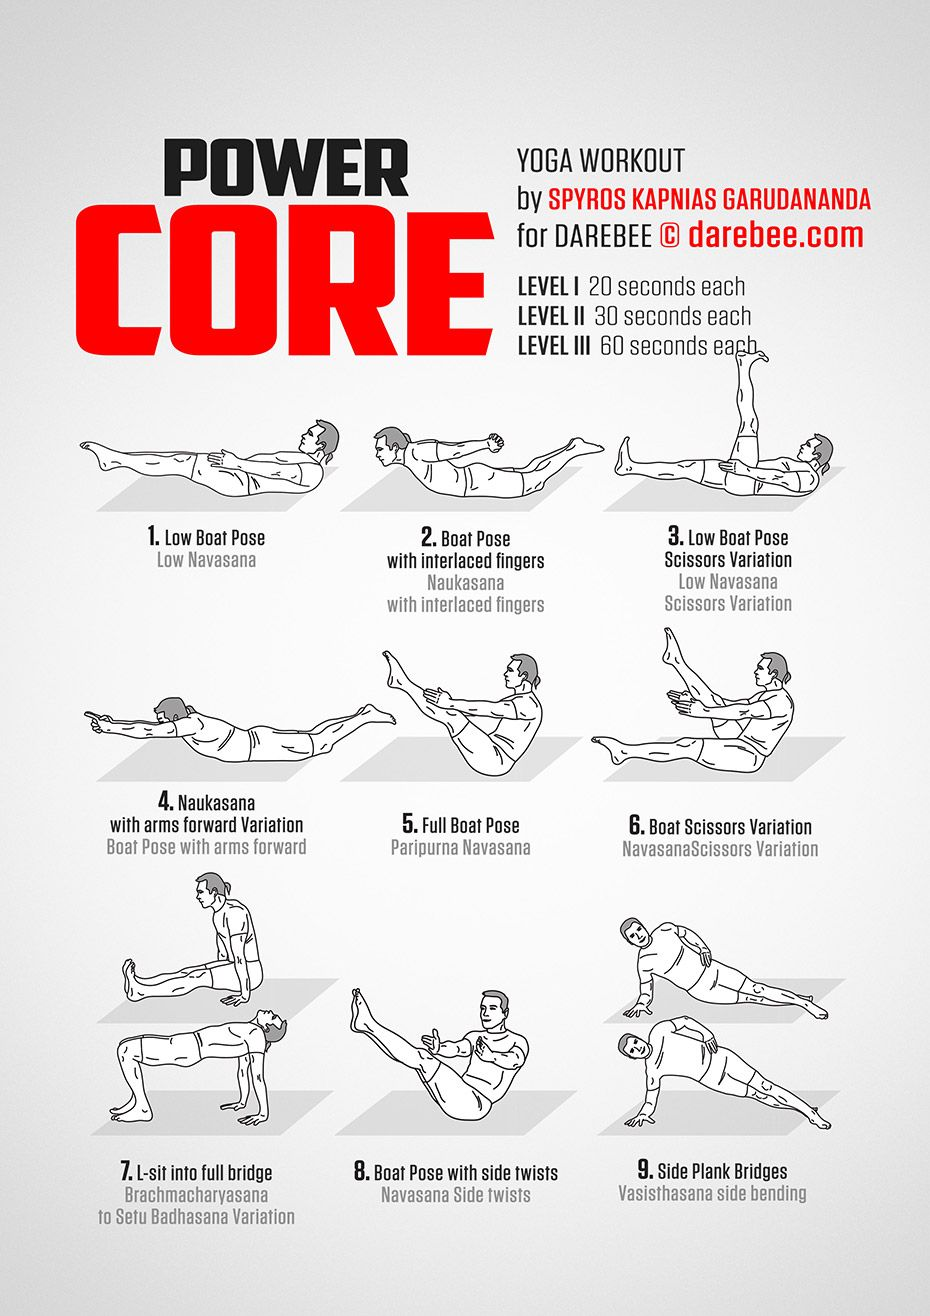 Power Core Workout Power Yoga Workout